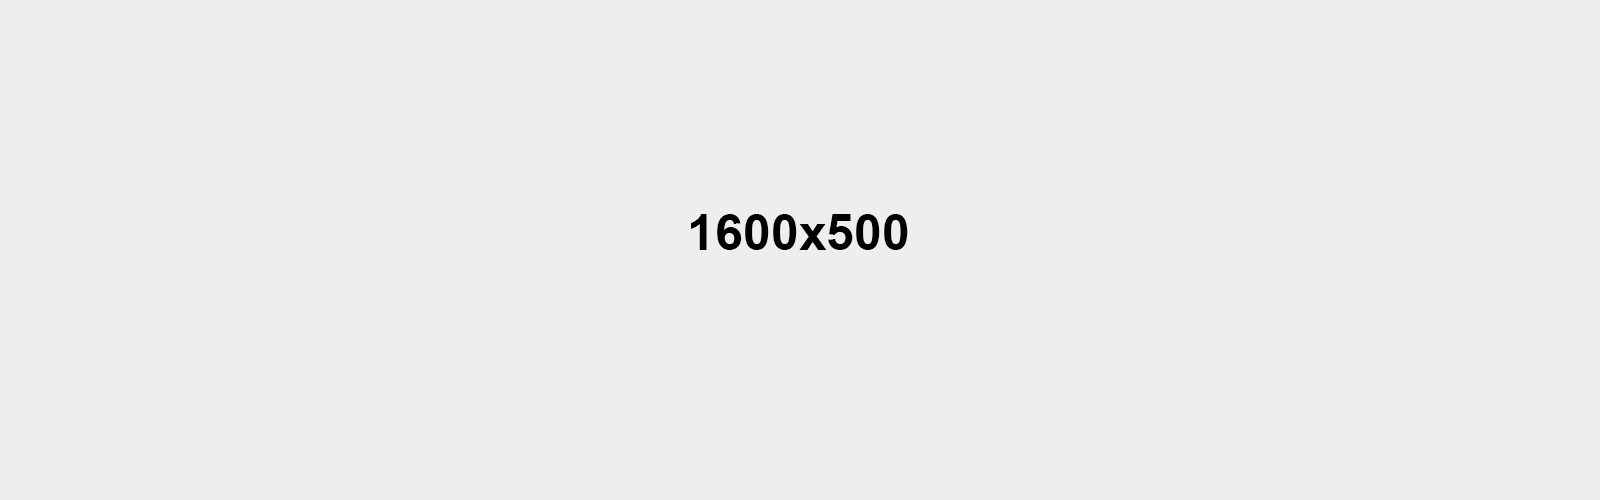 dummy_1600x500.jpg